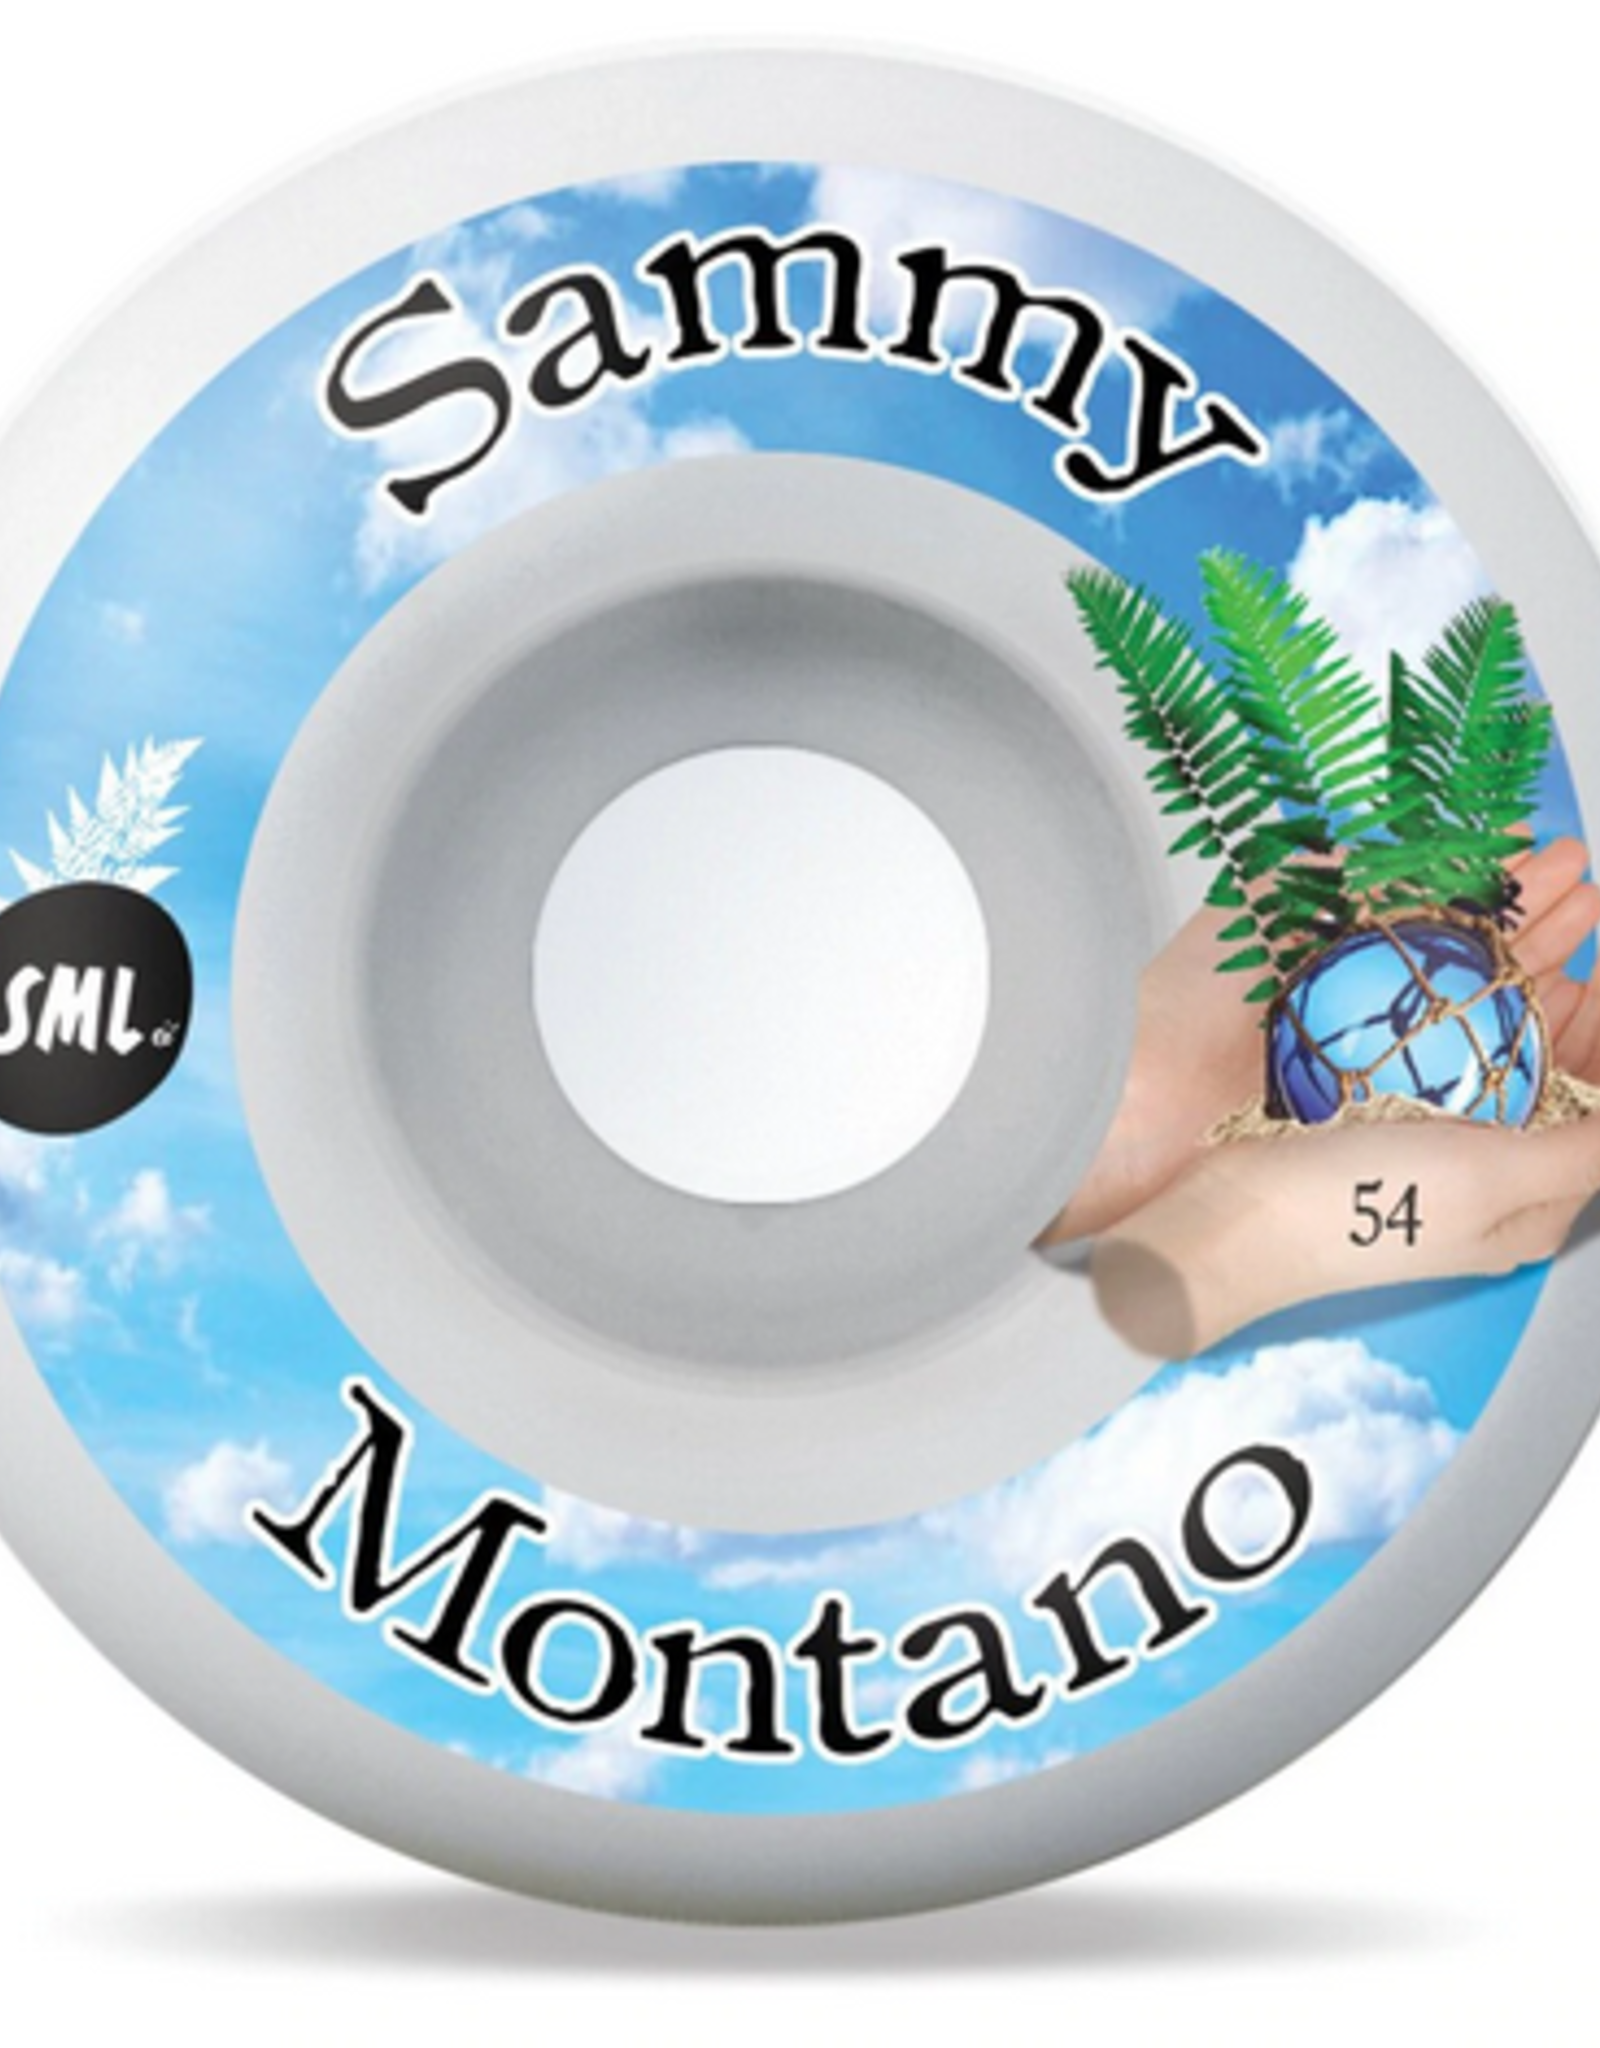 SML SML WHEELS TIDE POOL SAMMY MONTANO OG WIDE 99A 54MM